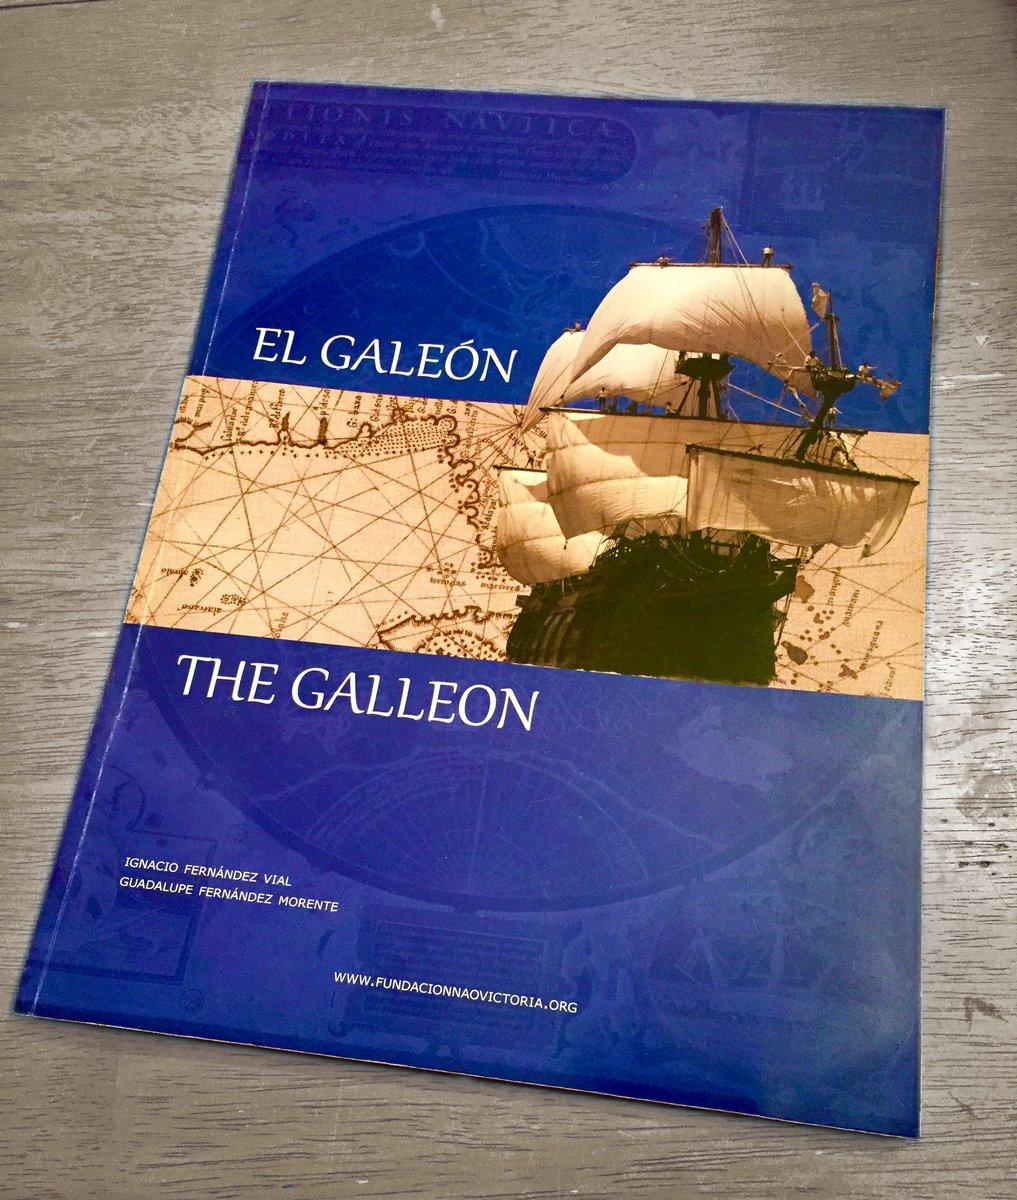 Galeon online shop